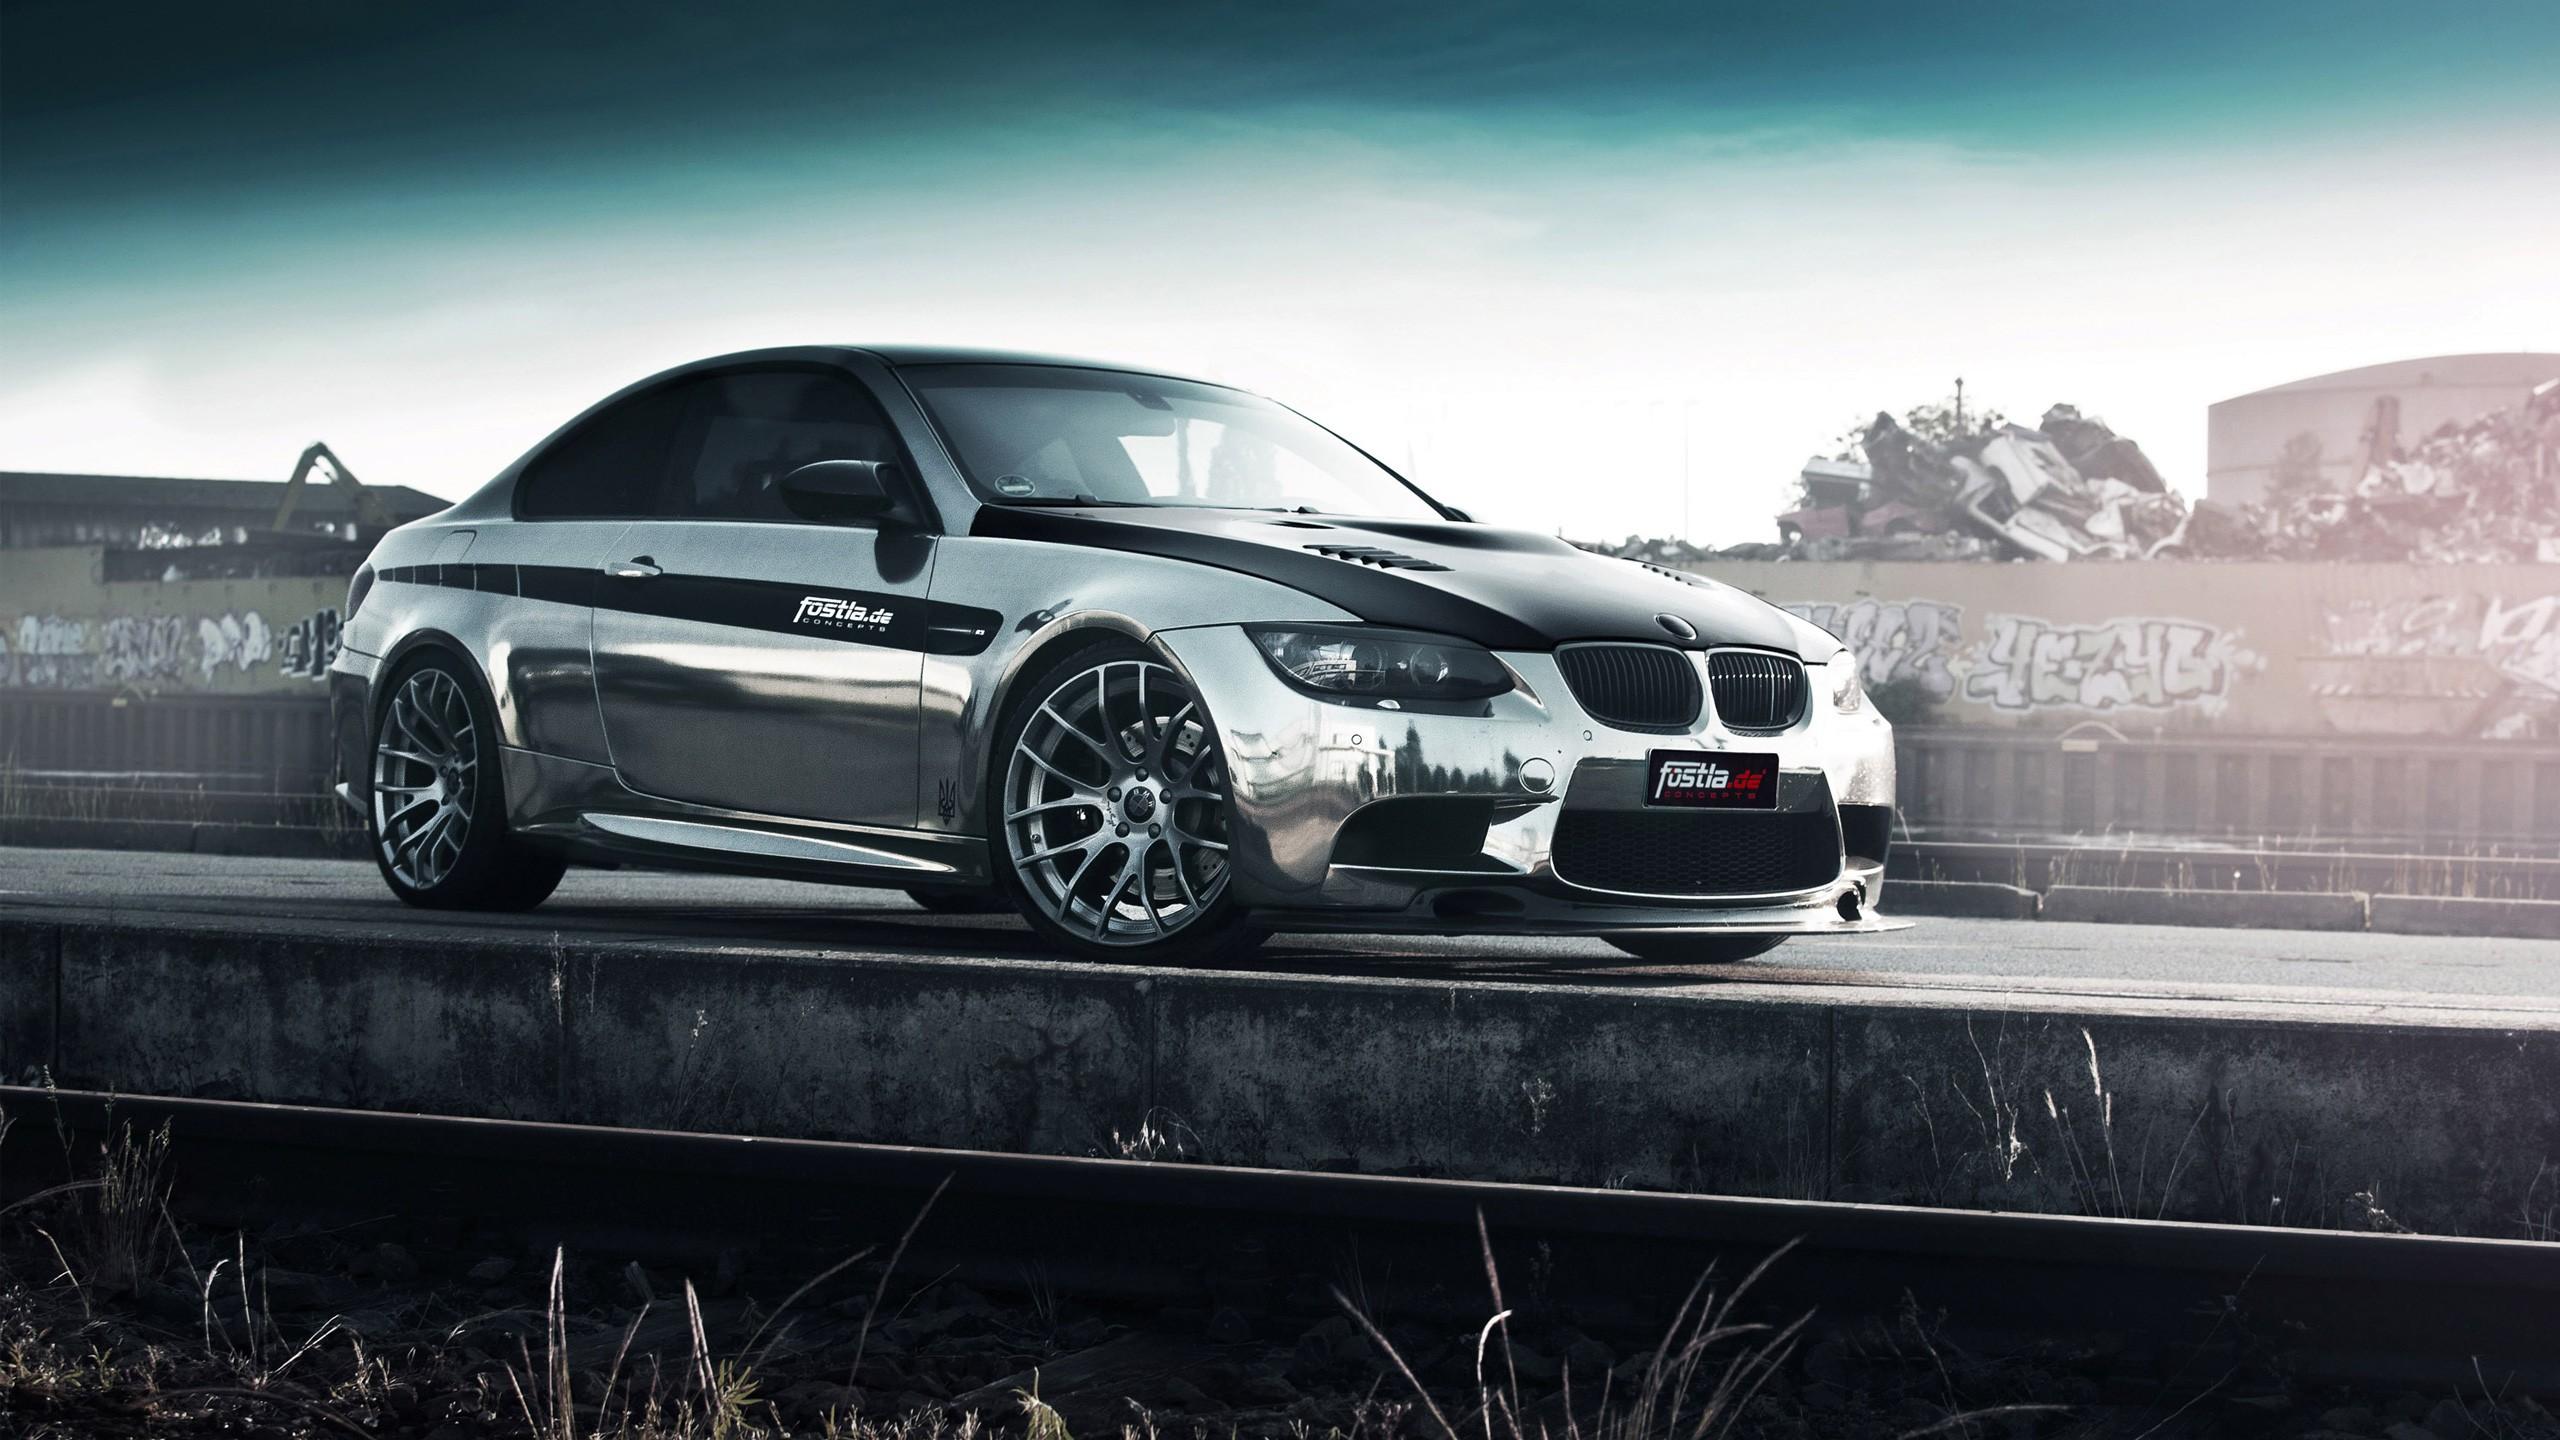 2016 Fostla de BMW M3 Coupe 2 Wallpaper | HD Car ...